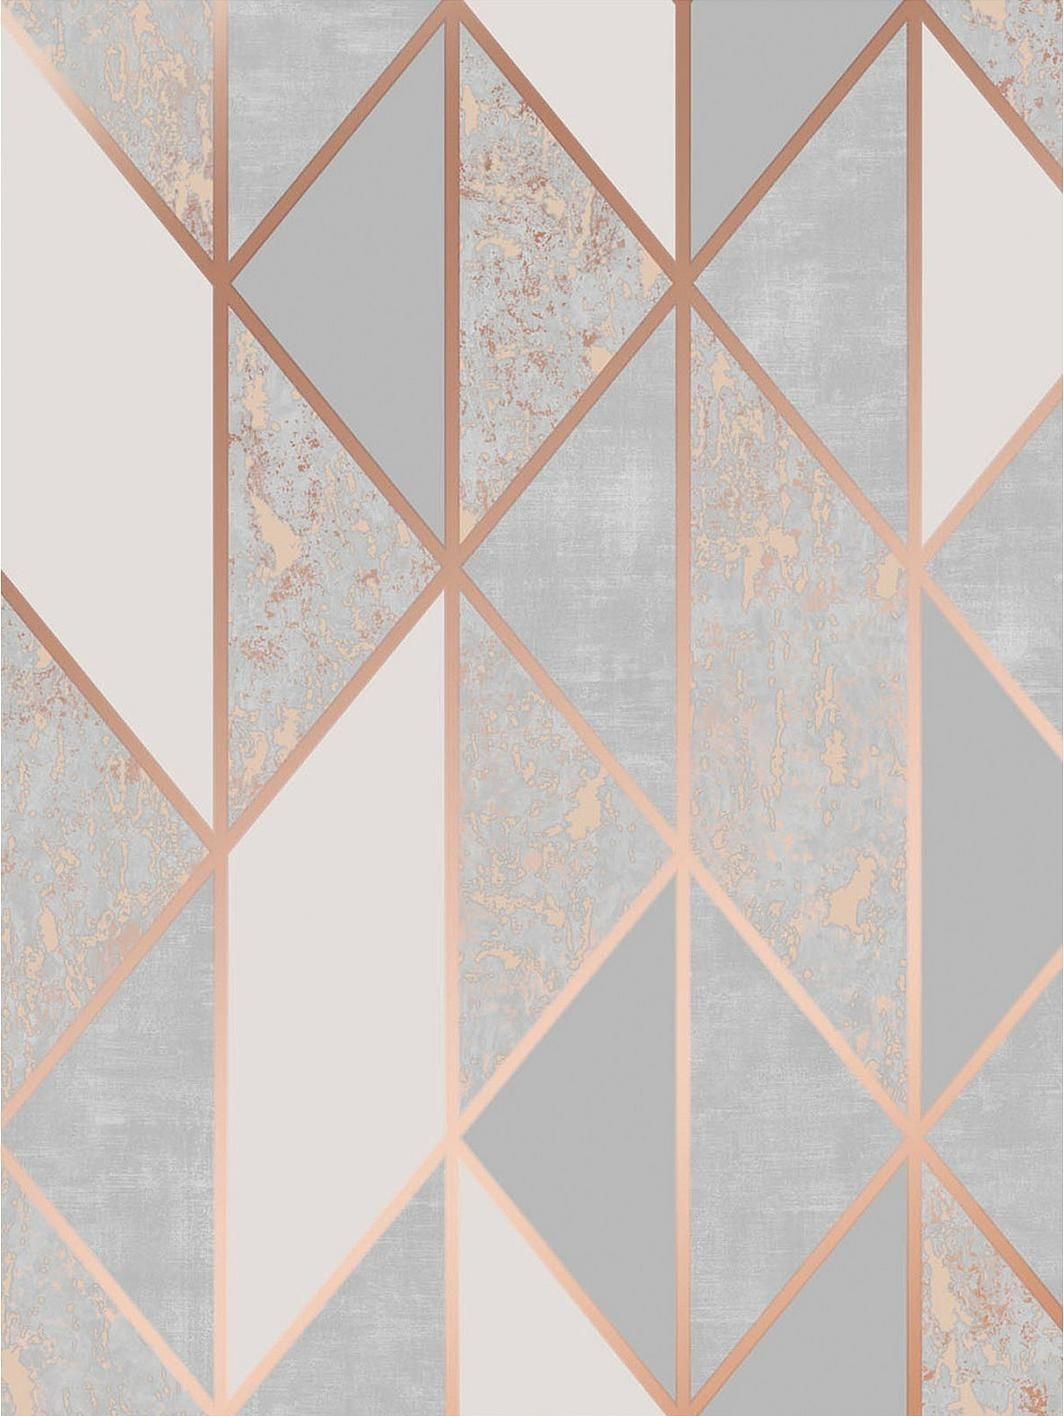 437201076325173668 Gold Geometric Wallpaper Gold Wallpaper Rose Gold Wallpaper